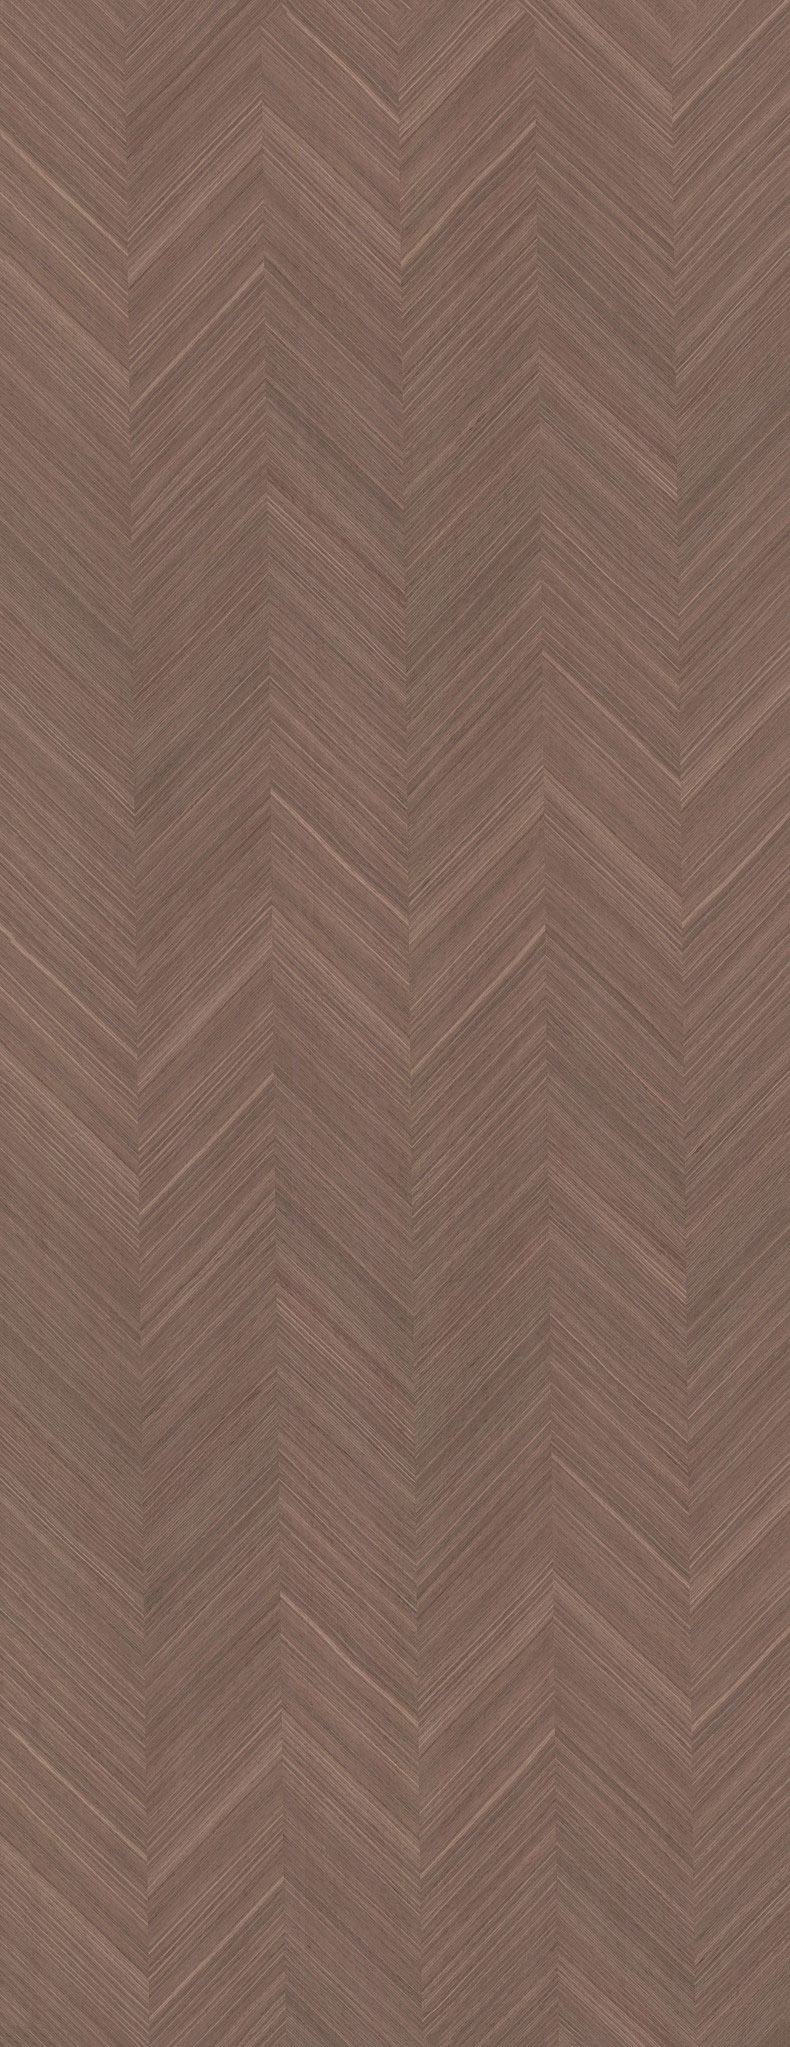 Recon Walnut Herringbone